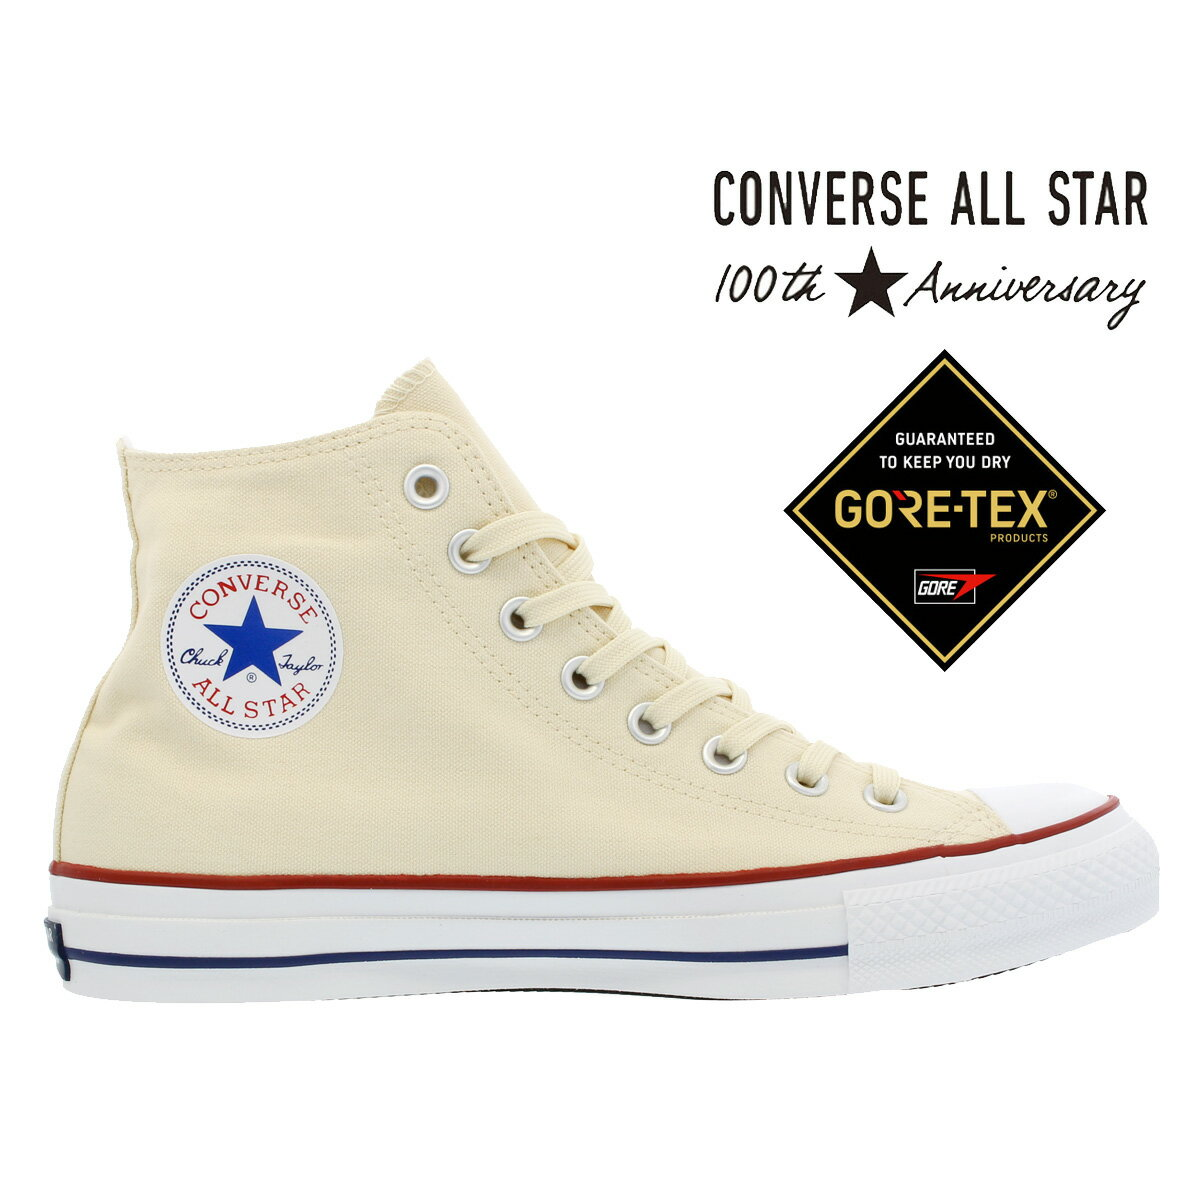 CONVERSE ALL STAR 100 GORE-TEX HI 【100周年】 【100th ANNIVERSARY】 コンバース オールスター 100 ゴア テックス HI NATURAL WHITE